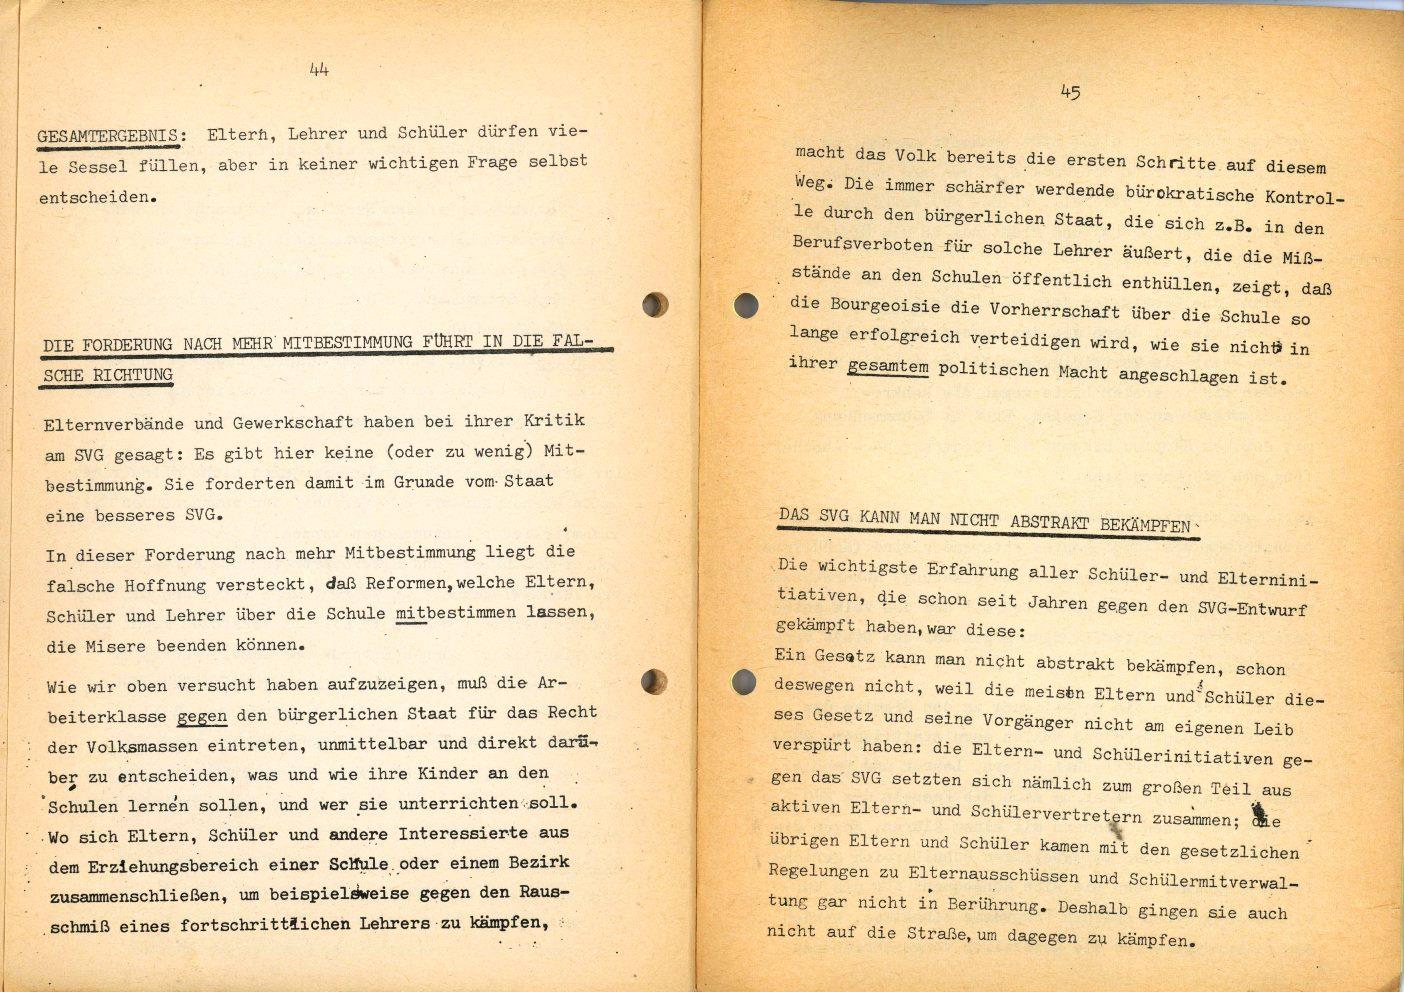 Berlin_SMV_GUV_1974_Schulmisere_25